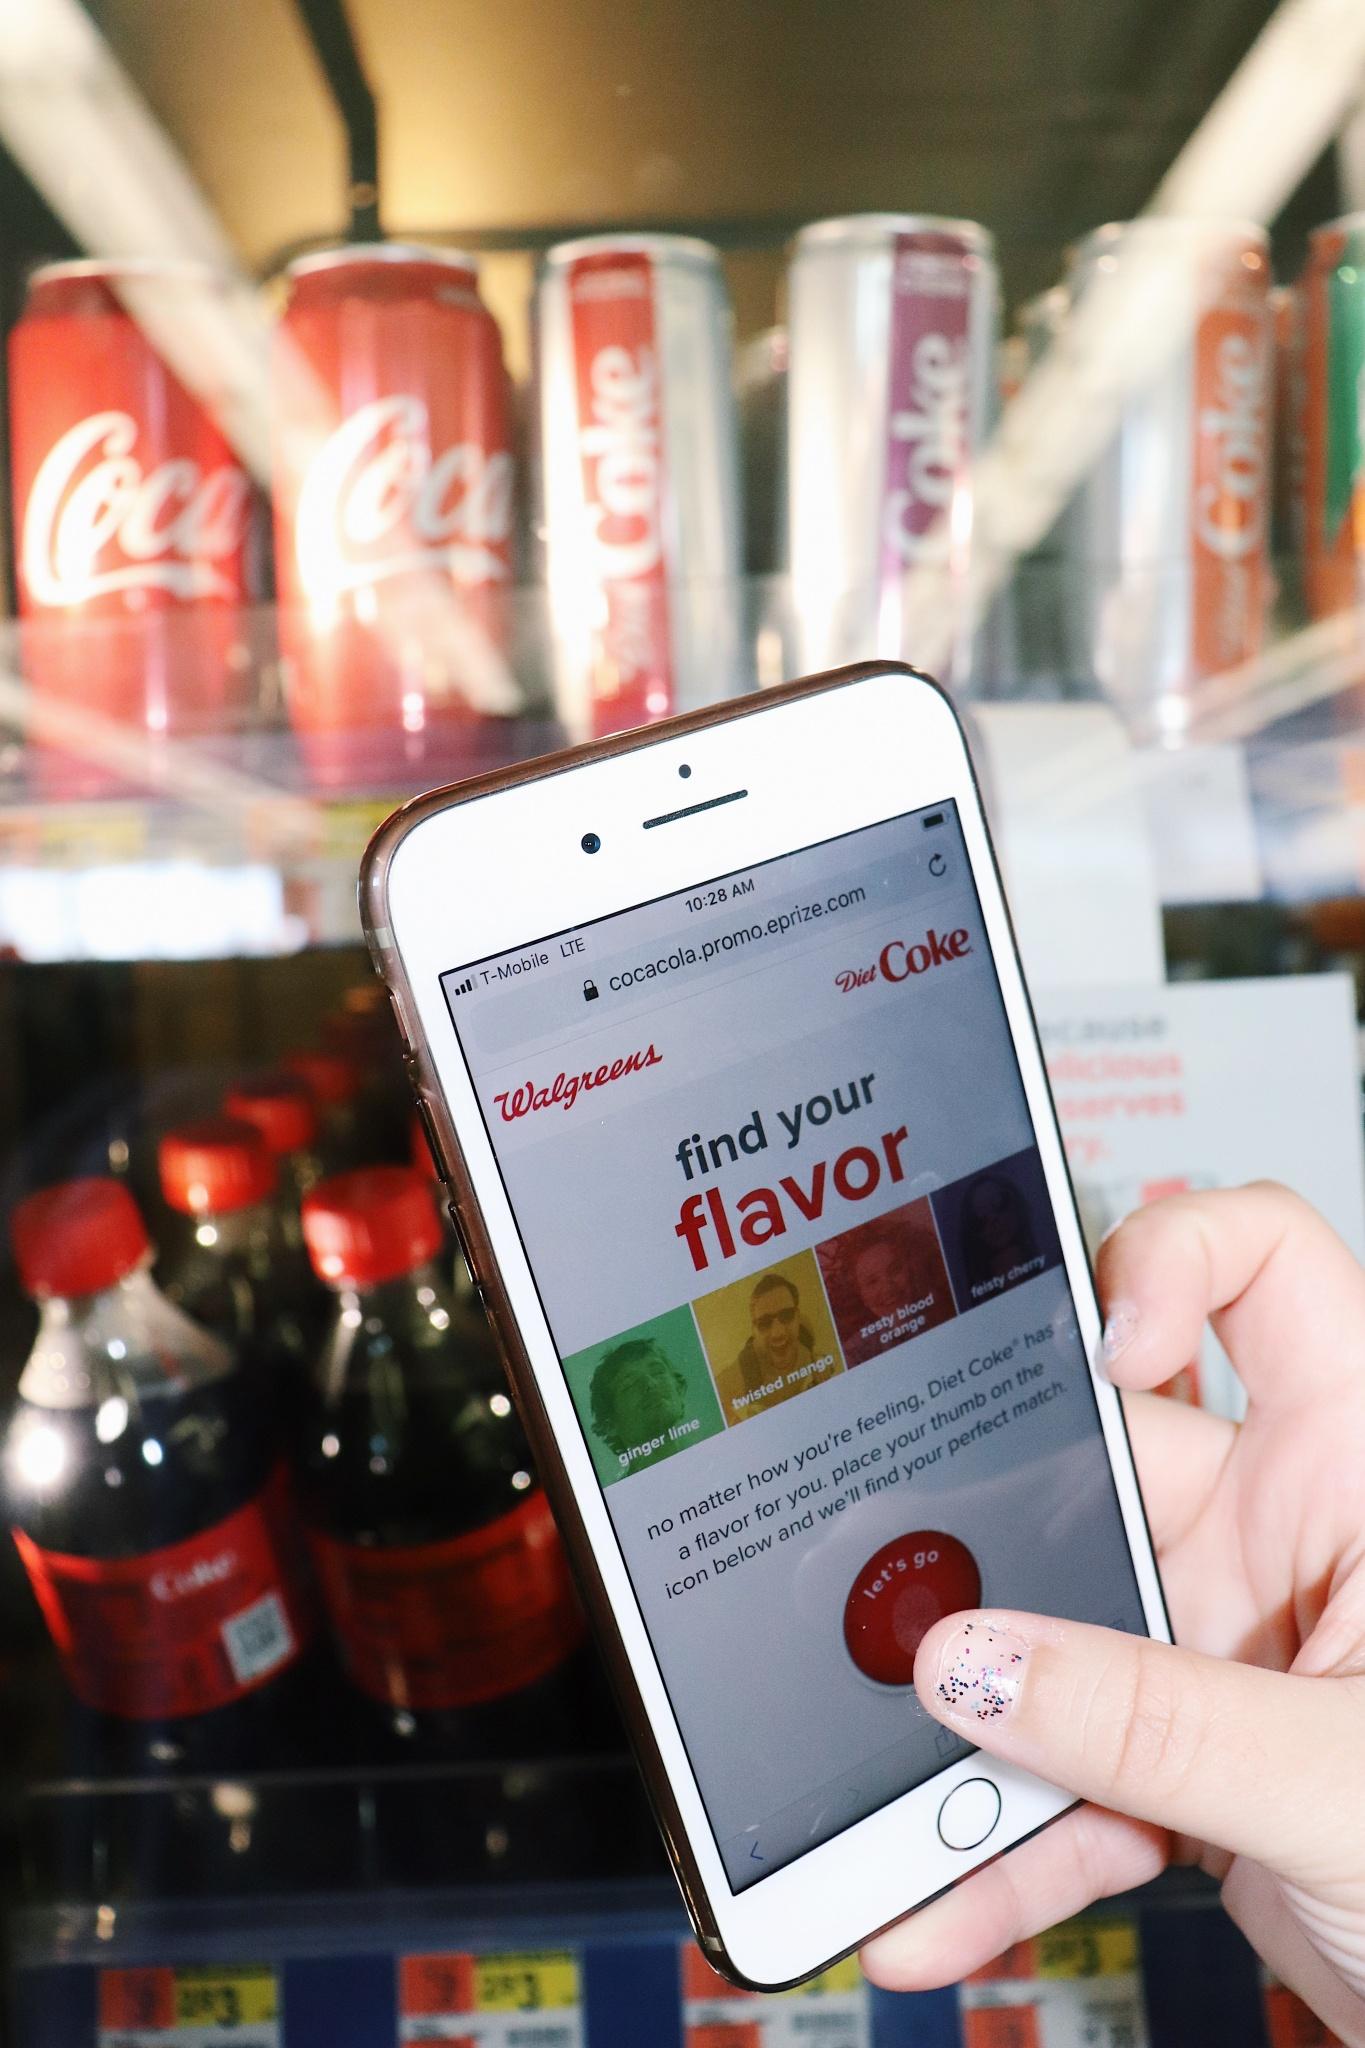 diet coke new flavors